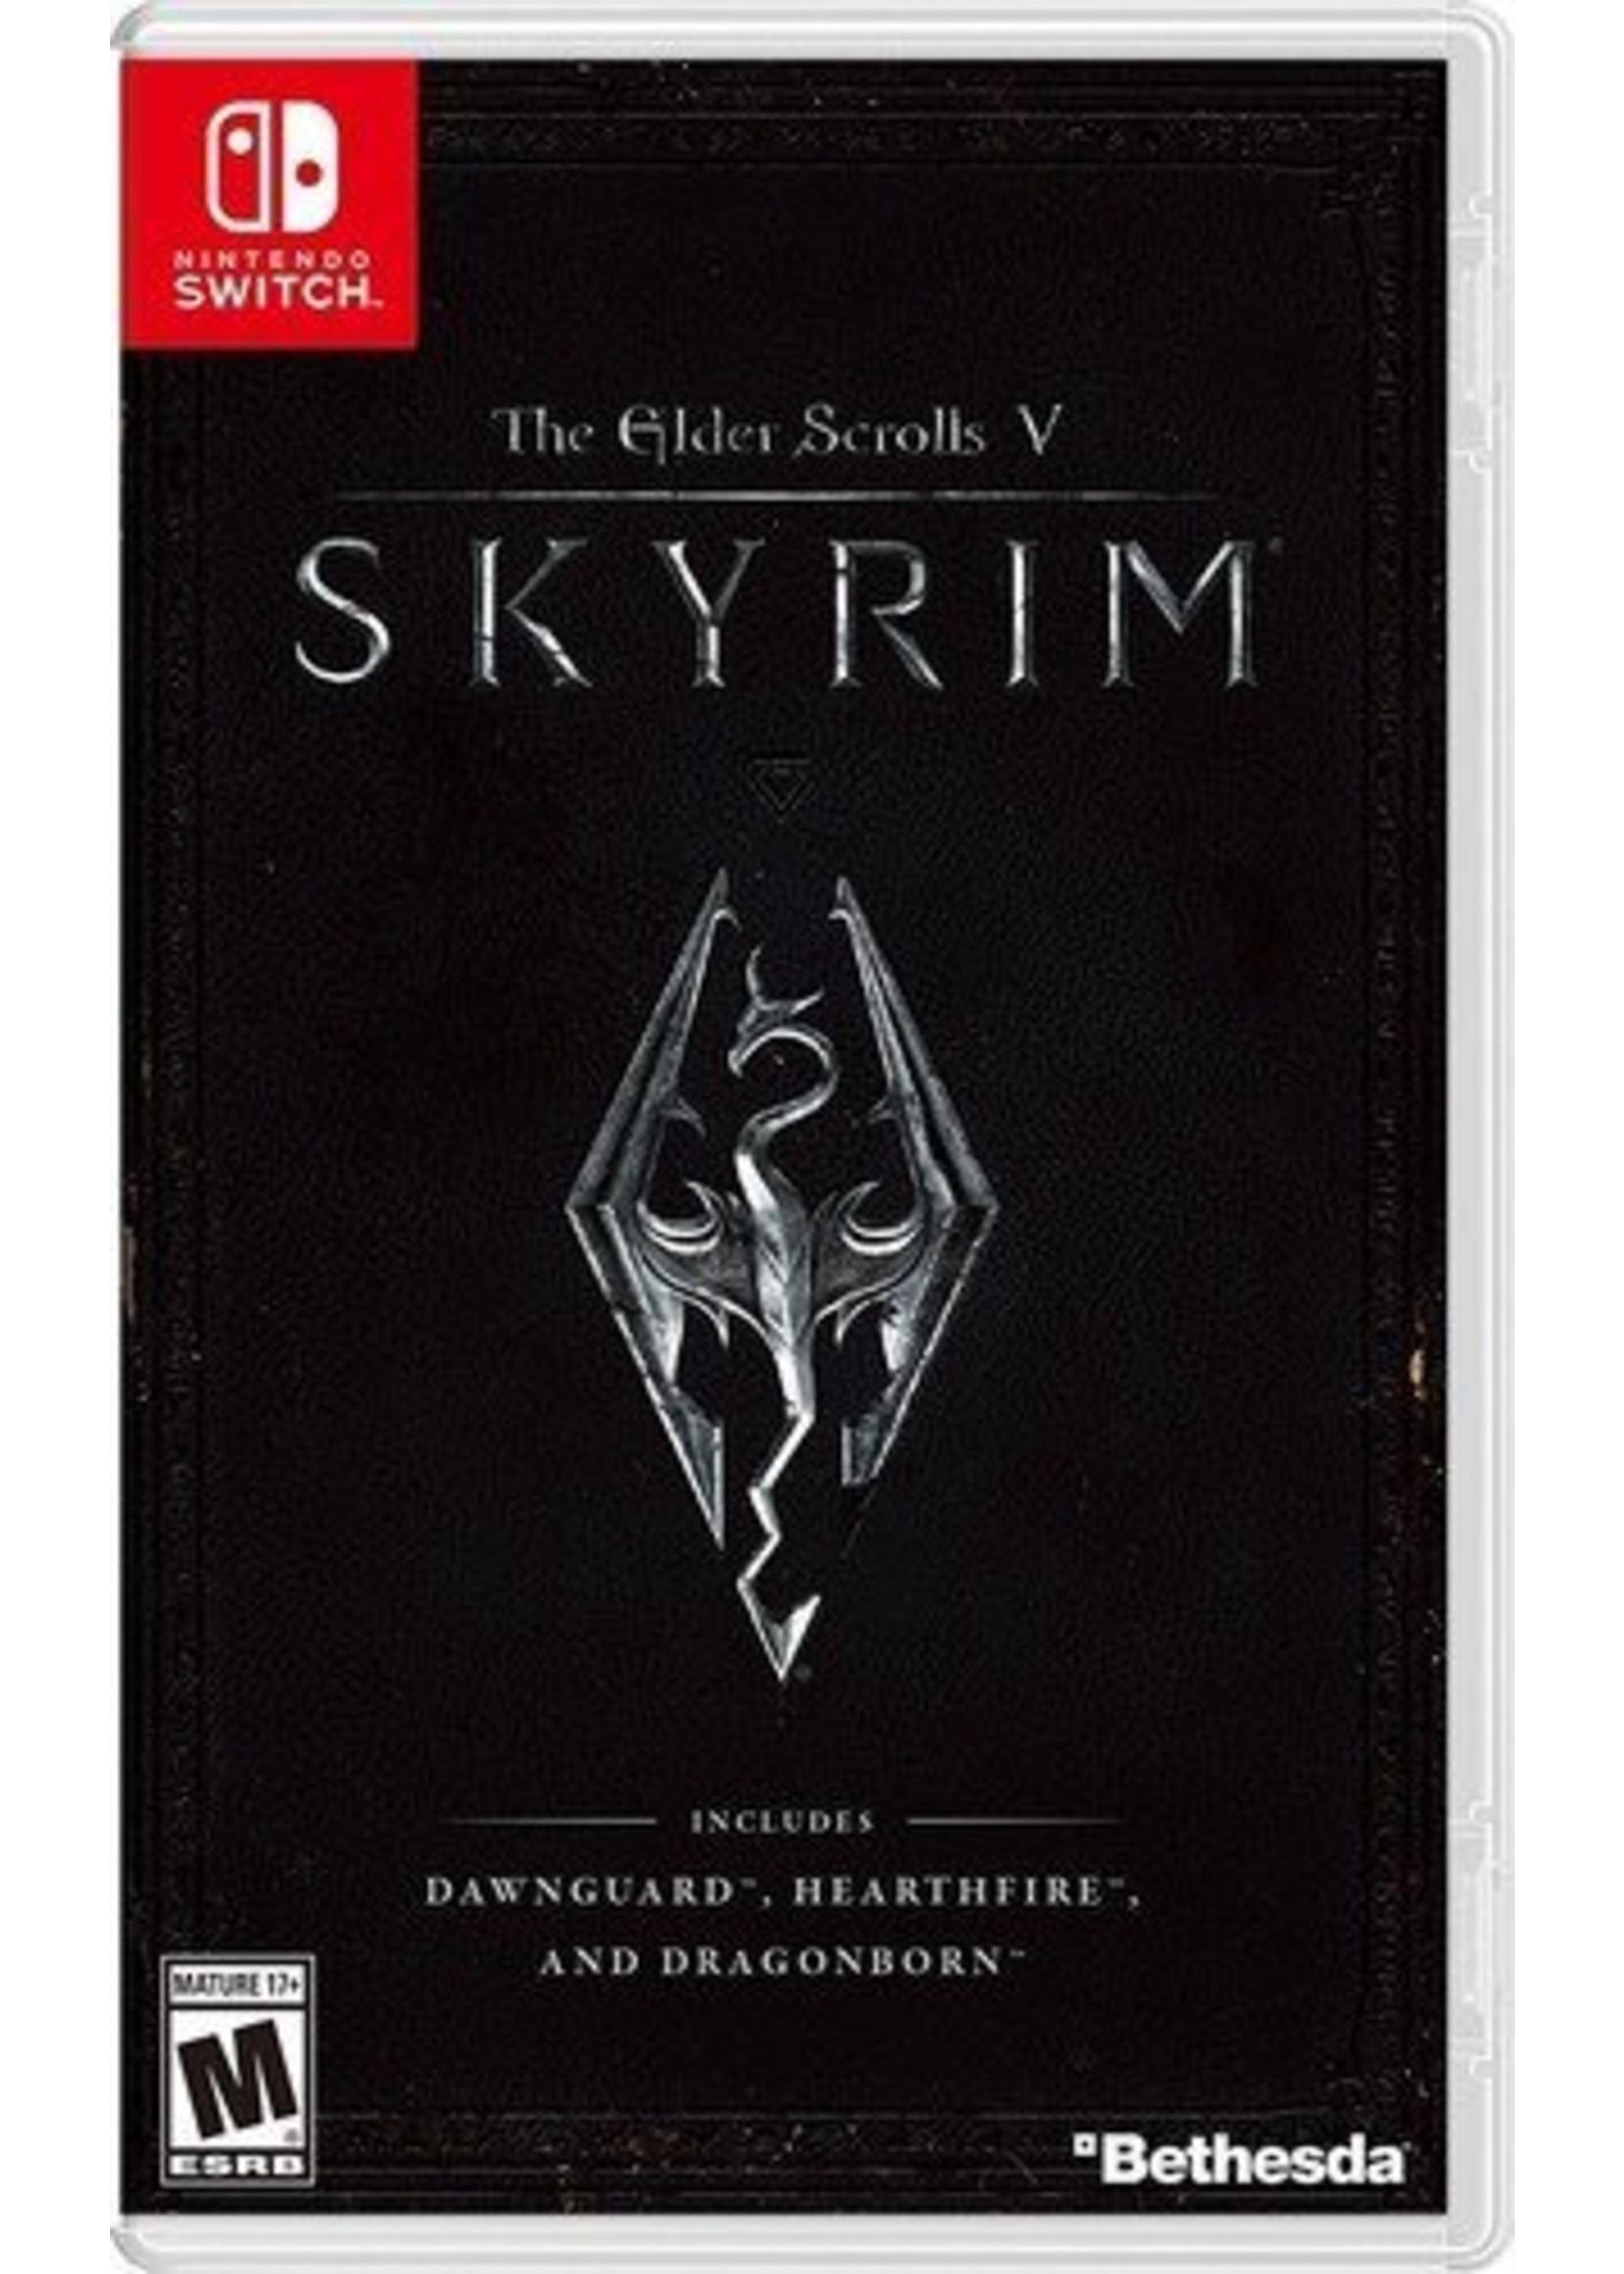 The Elder Scrolls 5: Skyrim - SWITCH PrePlayed